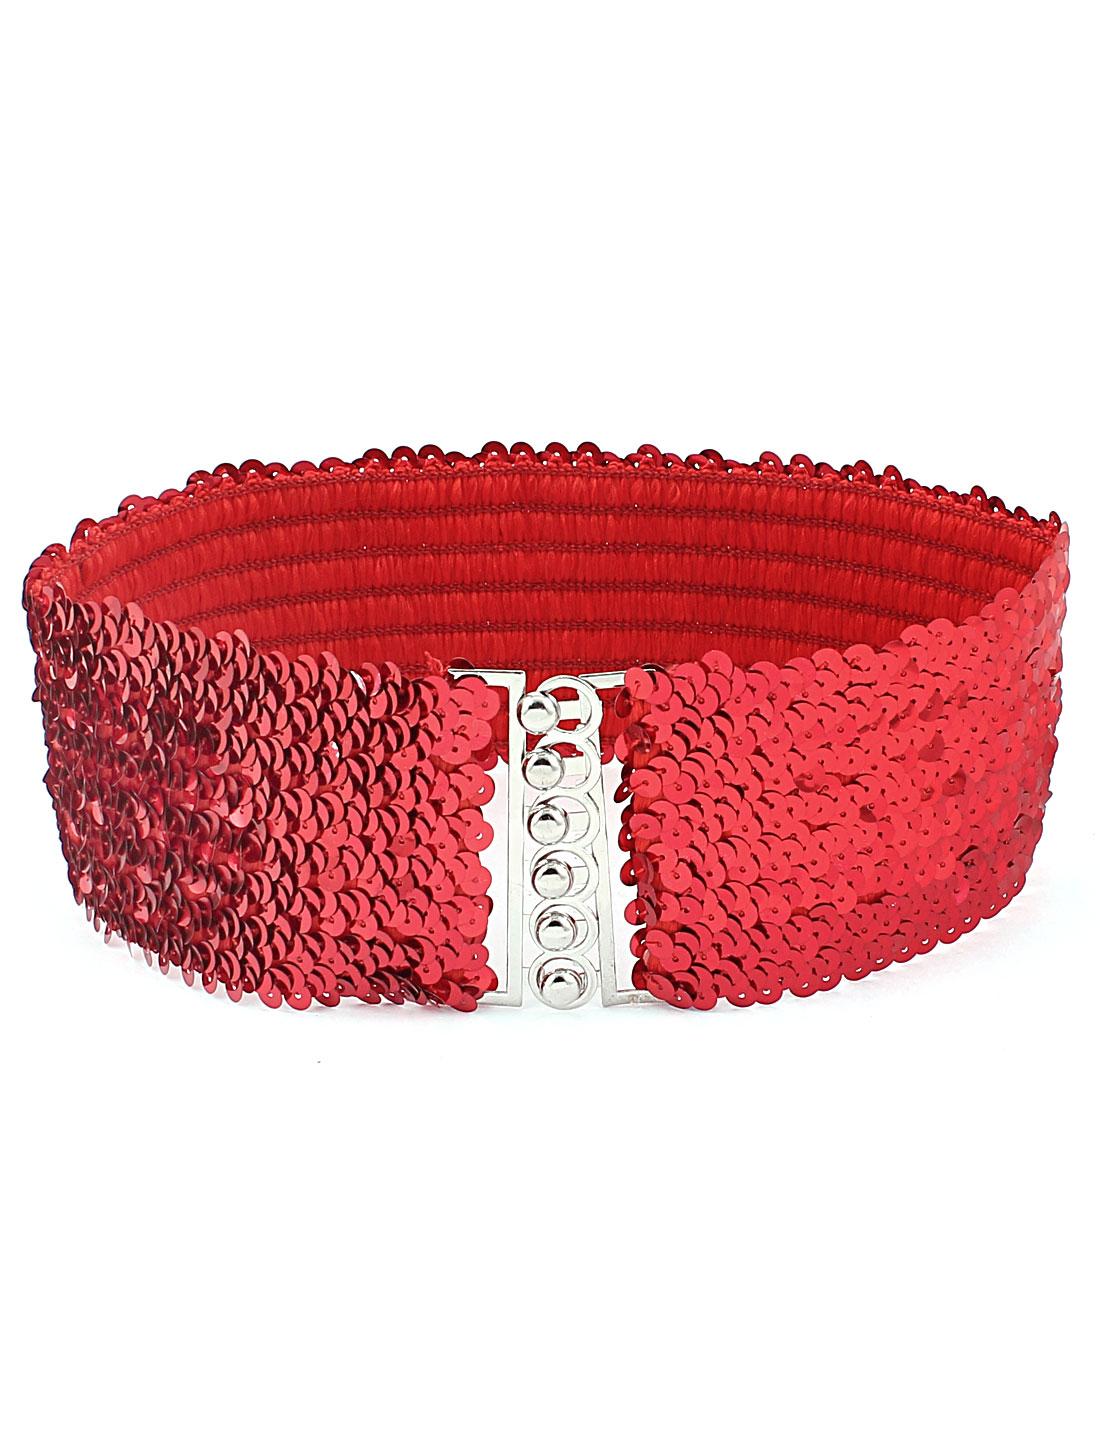 Woman Interlocking Link Plastic Sequin Decor Elastic Waist Band Belt Red